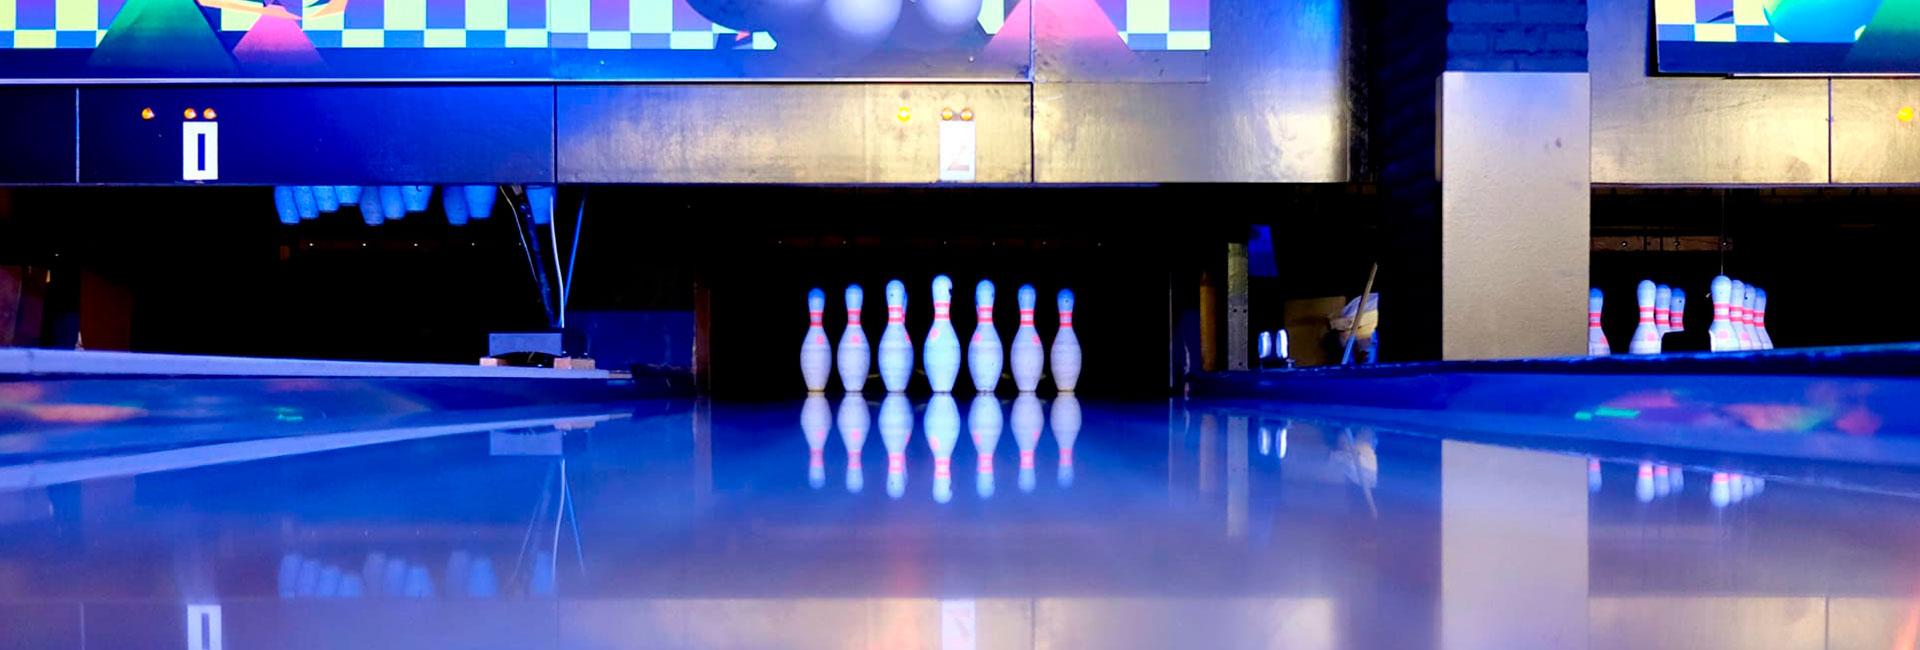 kegler til en julefrokost med bowling